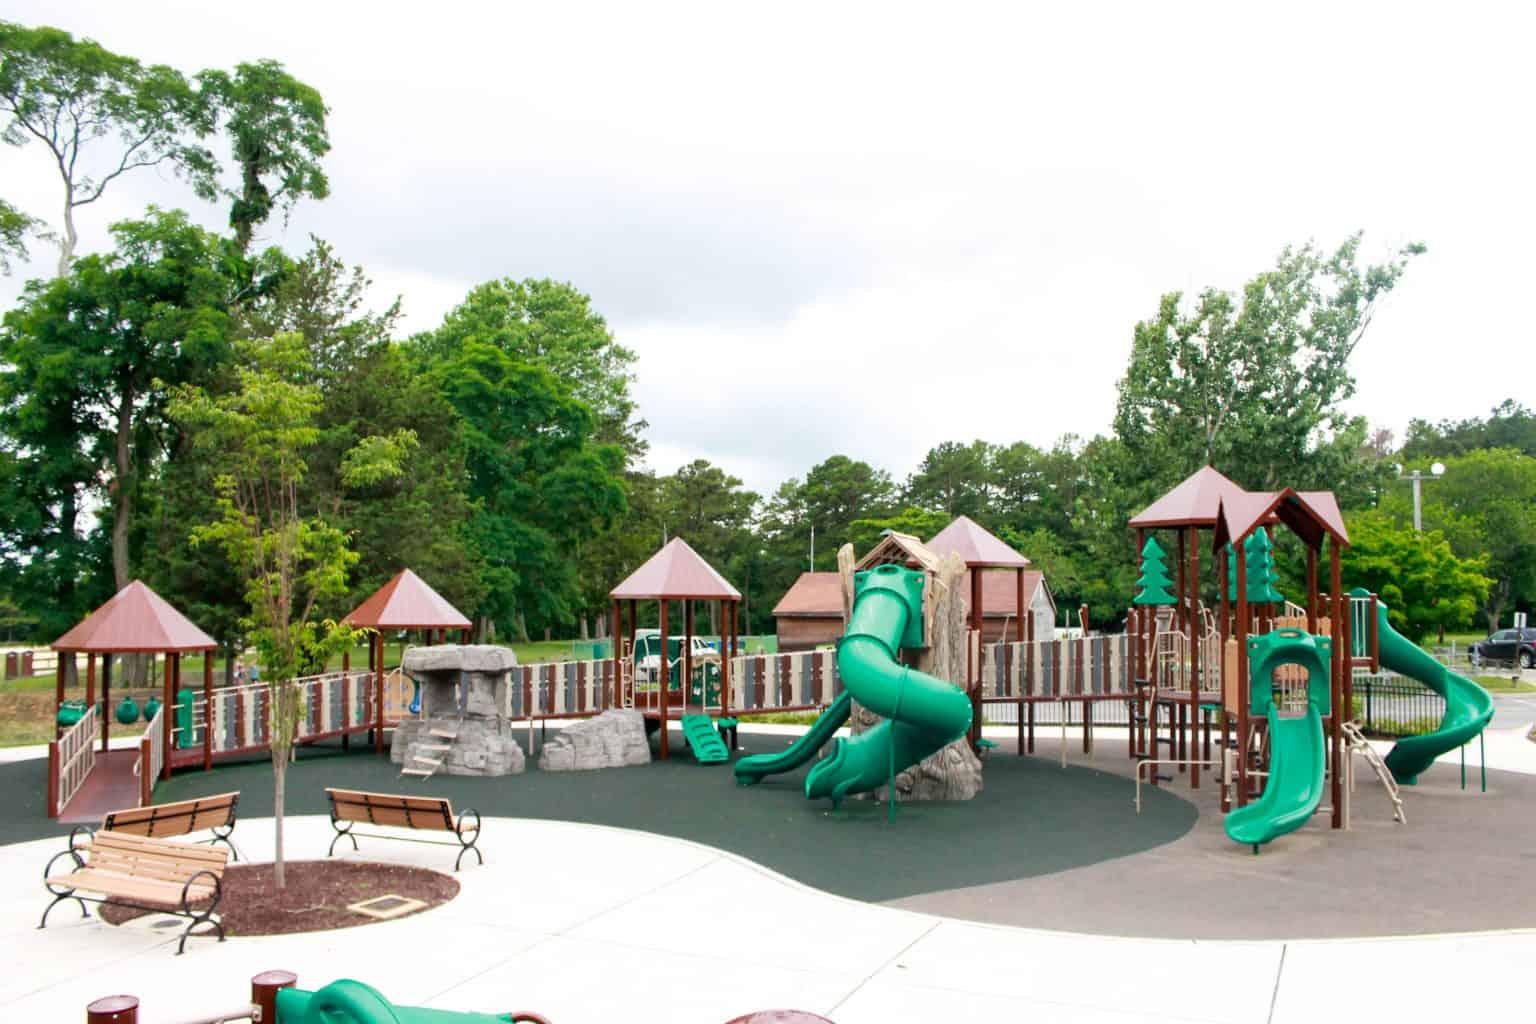 windward-beach-park-playground-brick-nj_27651422643_o-1-1536x1024